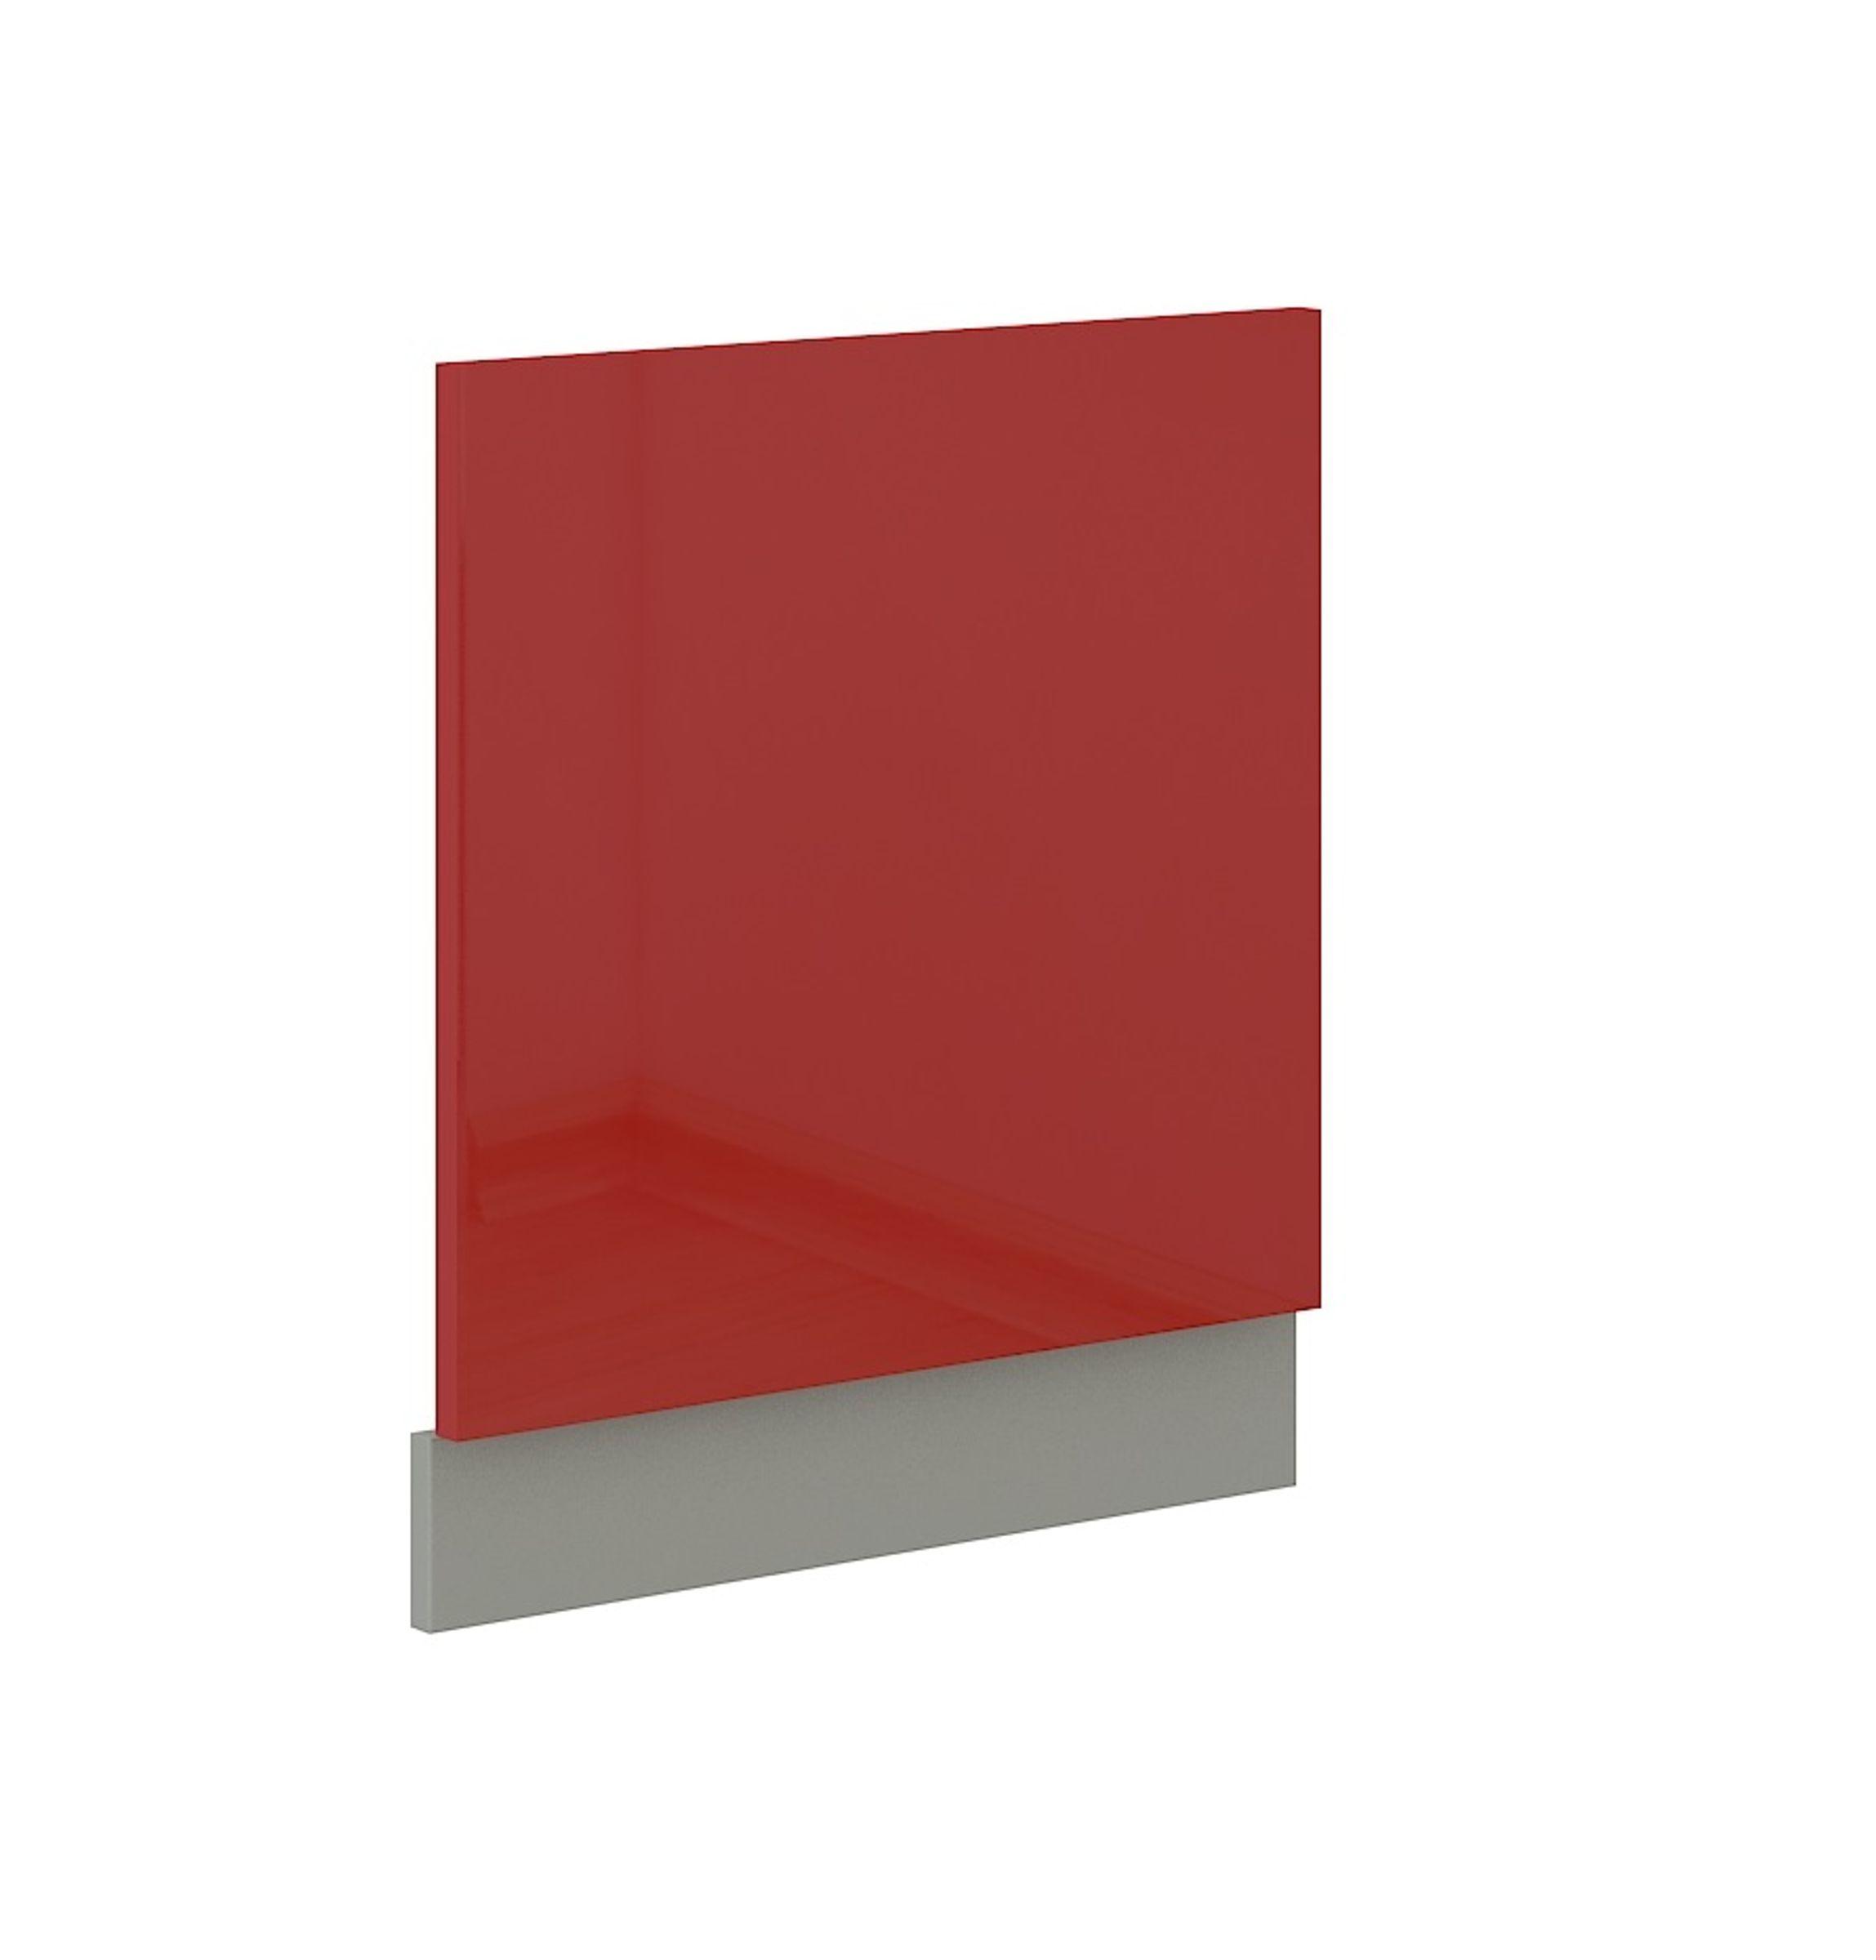 Frontblende für integrierten Geschirrspüler 60 cm Rose Hochglanz rot – Bild 1